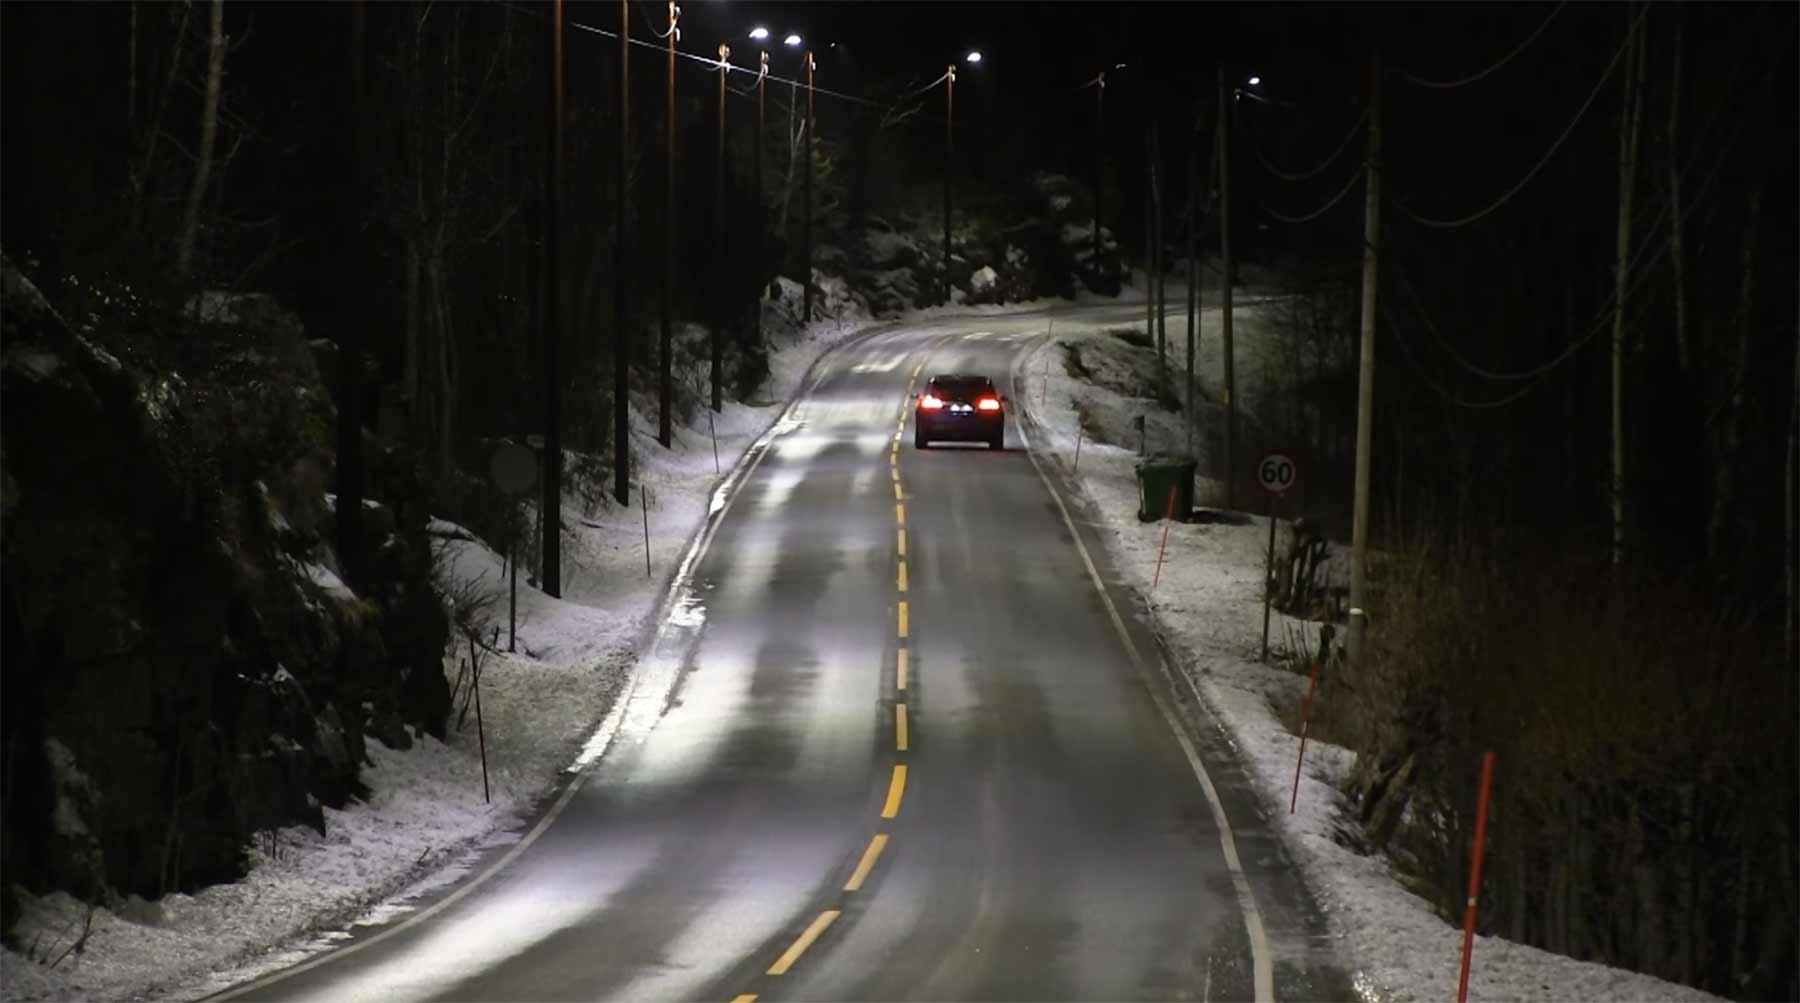 In Norwegen haben Straßenlaternen Bewegungsmelder strassenlaternen-energiesparen-bewegungsmelder-1